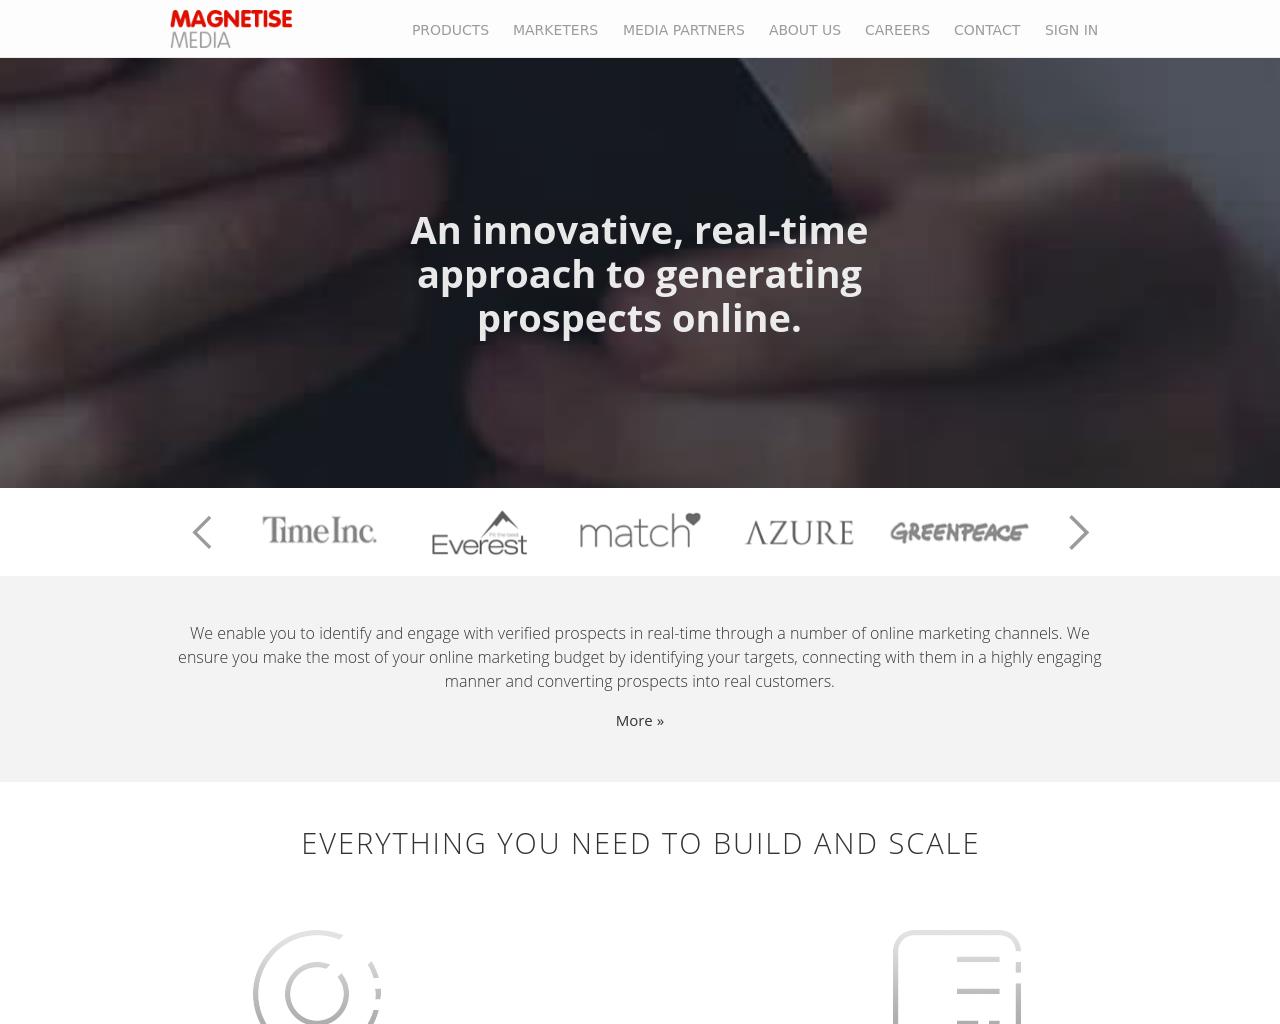 Magnetise-Media-Advertising-Reviews-Pricing